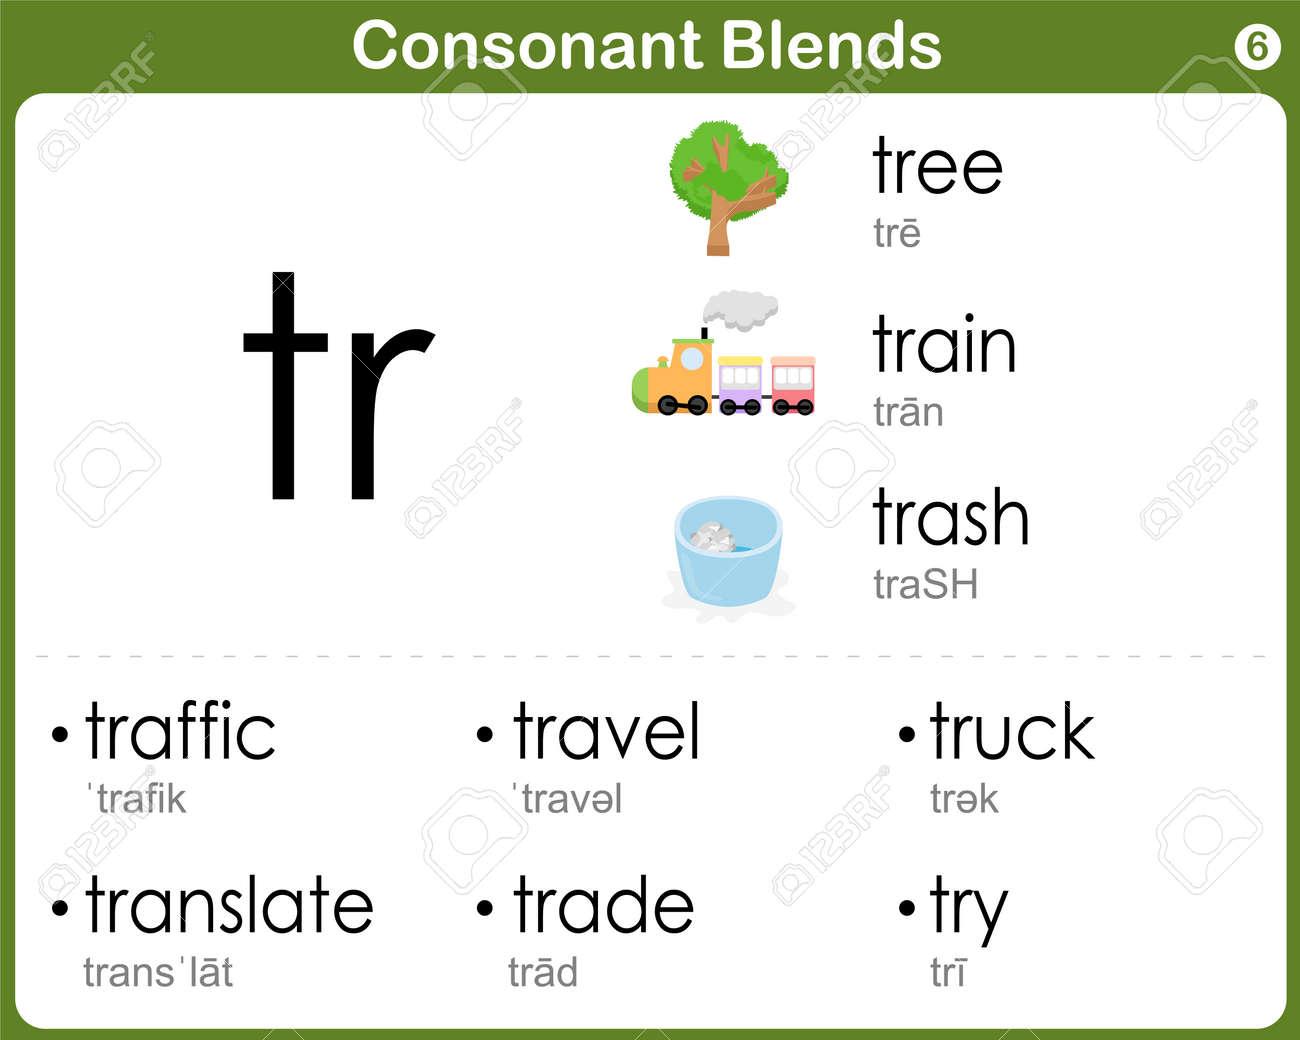 Worksheet Consonant Blends consonant blends worksheets for kindergarten on worksheet kids royalty free cliparts vectors